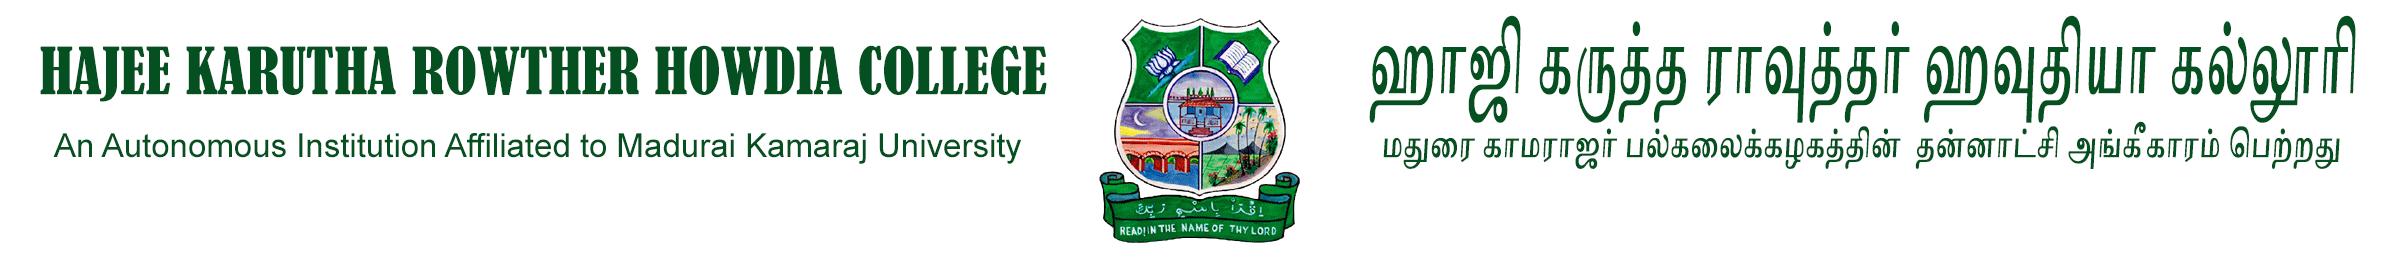 Hajee Karutha Rowther Howdia College